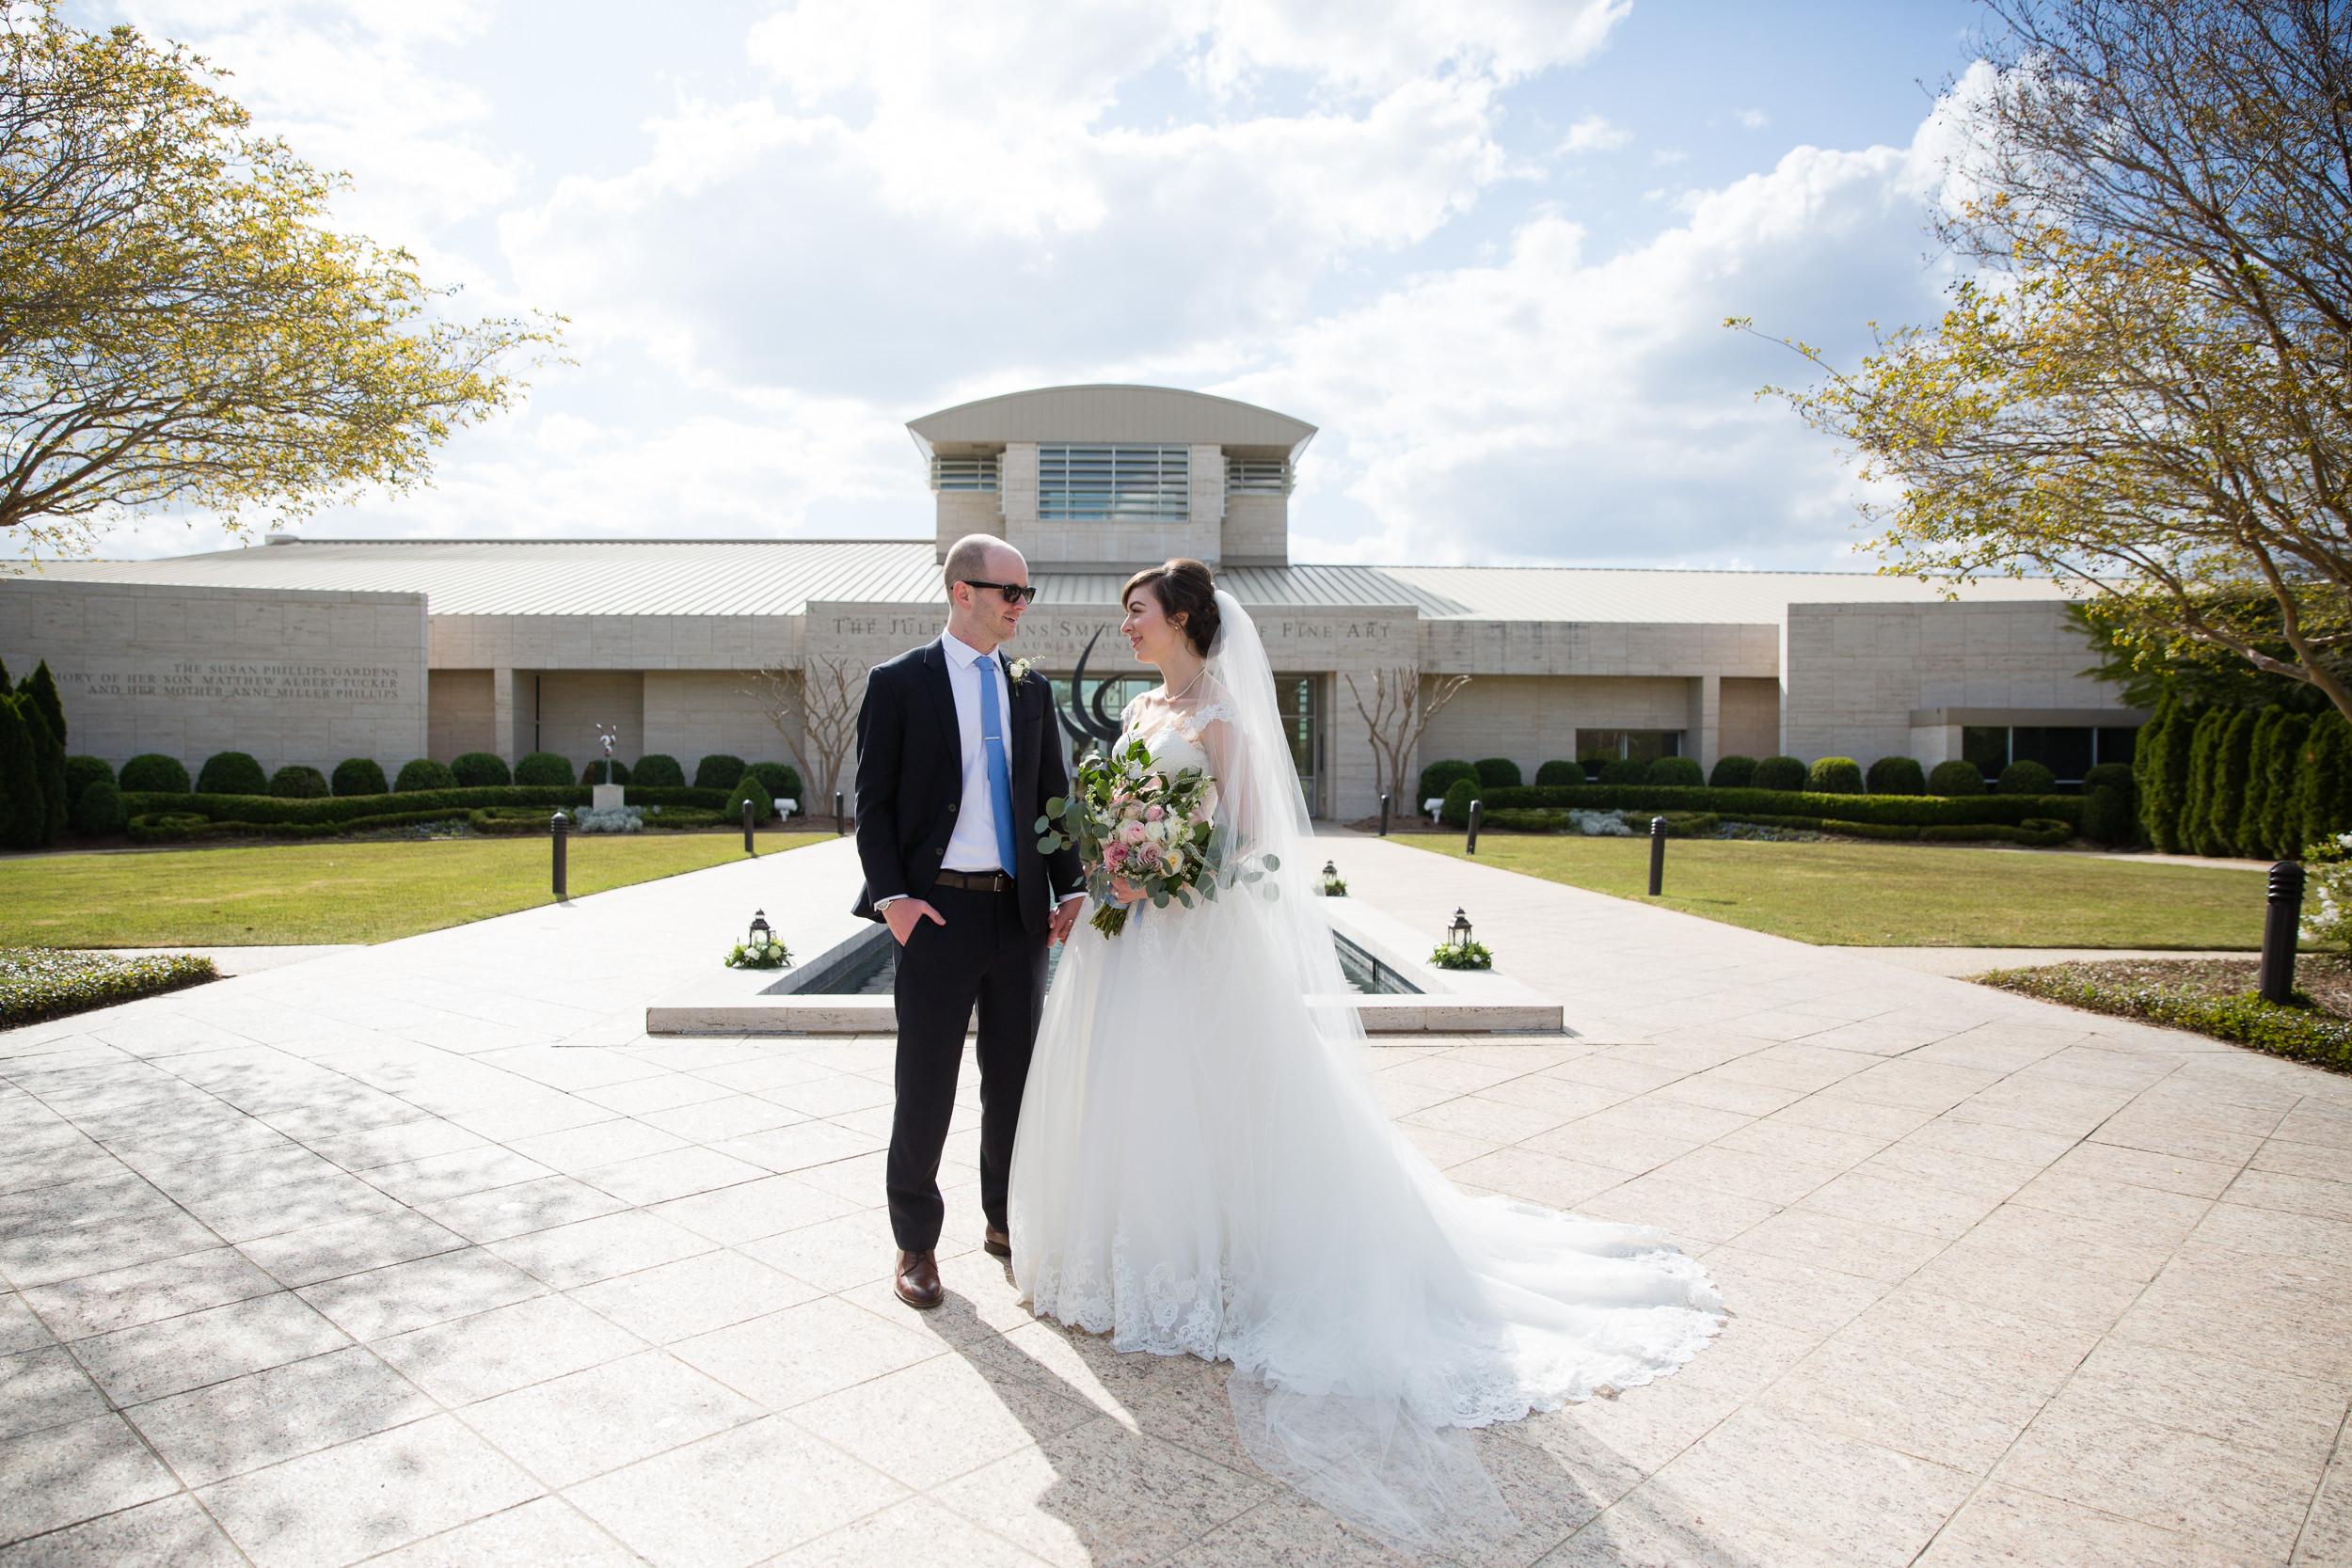 AB_Auburn_Wedding_2019-00037.jpg